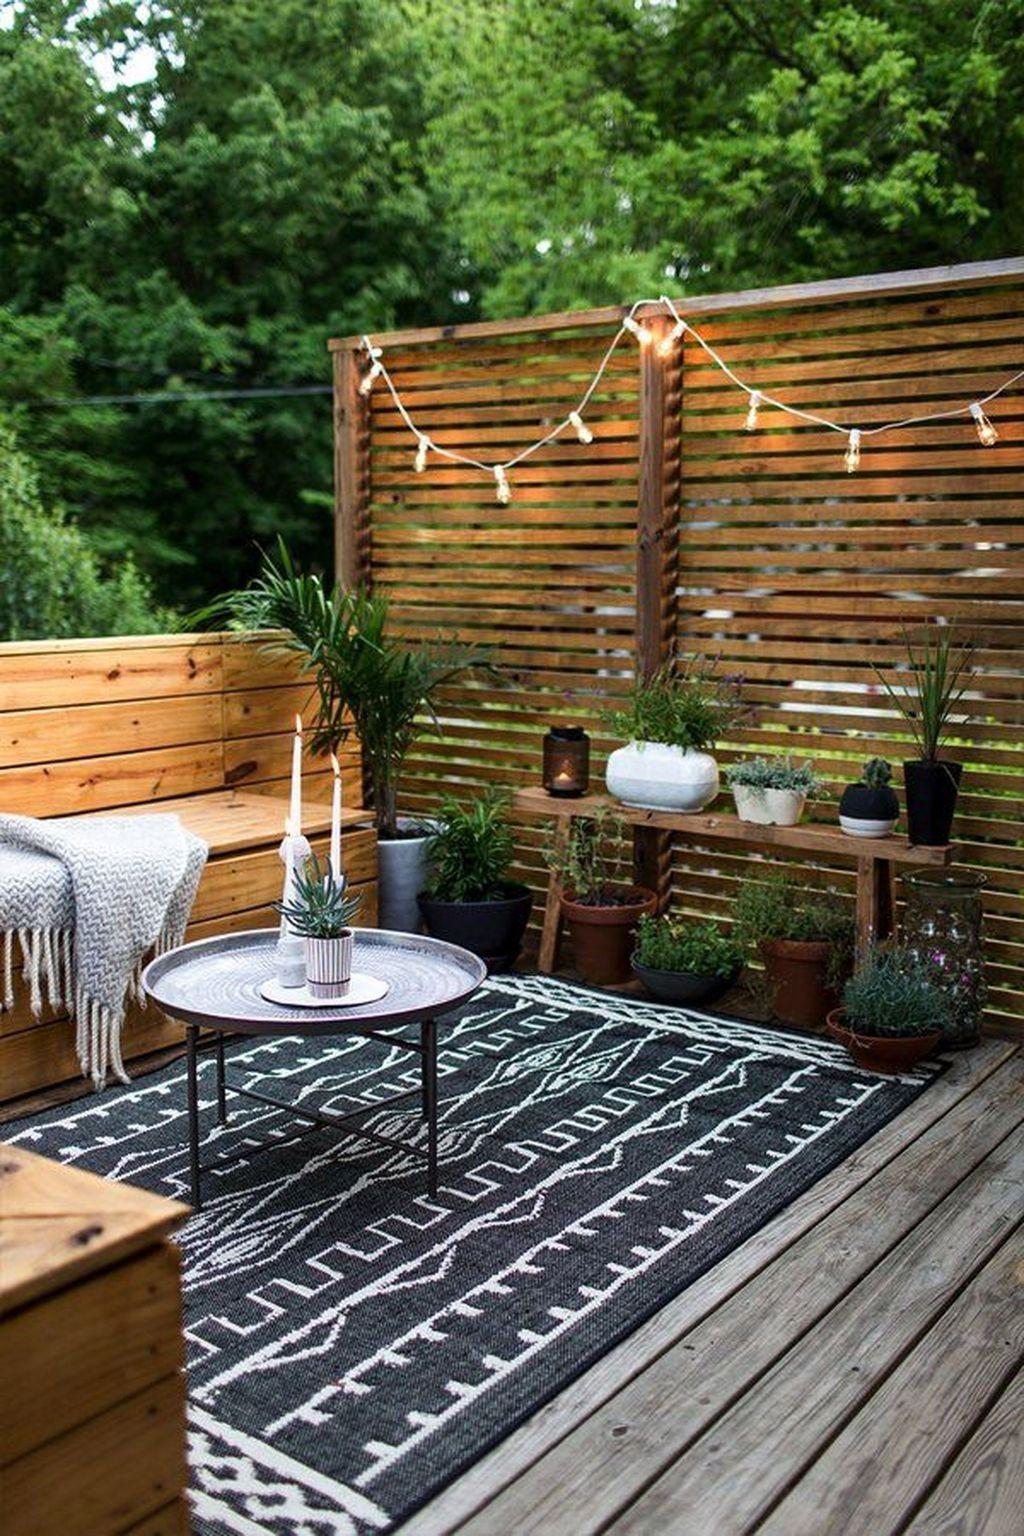 50 Amazing Decorative Outdoor Rugs Patio Ideas Small Backyard Landscaping Backyard Budget Backyard